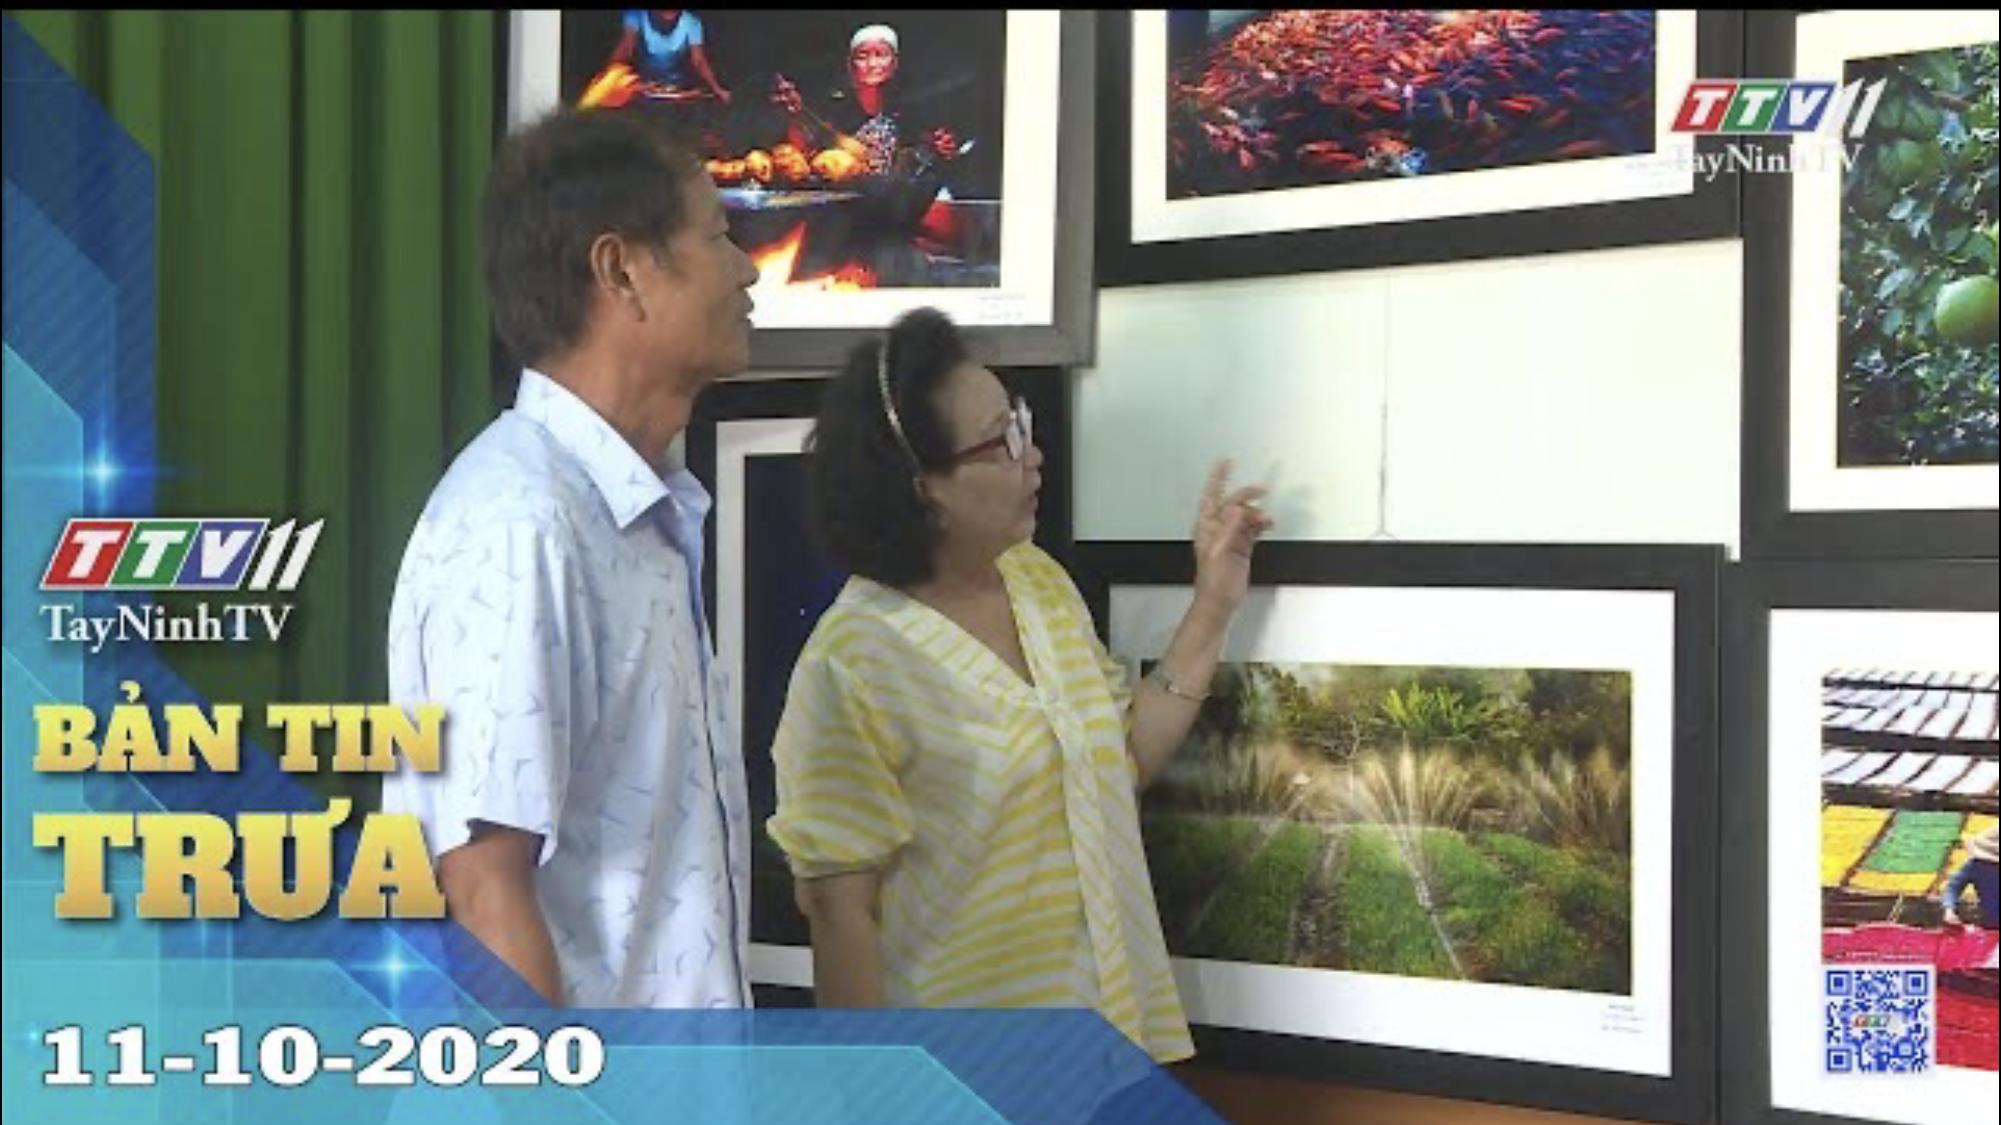 Bản tin trưa 11-10-2020 | Tin tức hôm nay | TayNinhTV